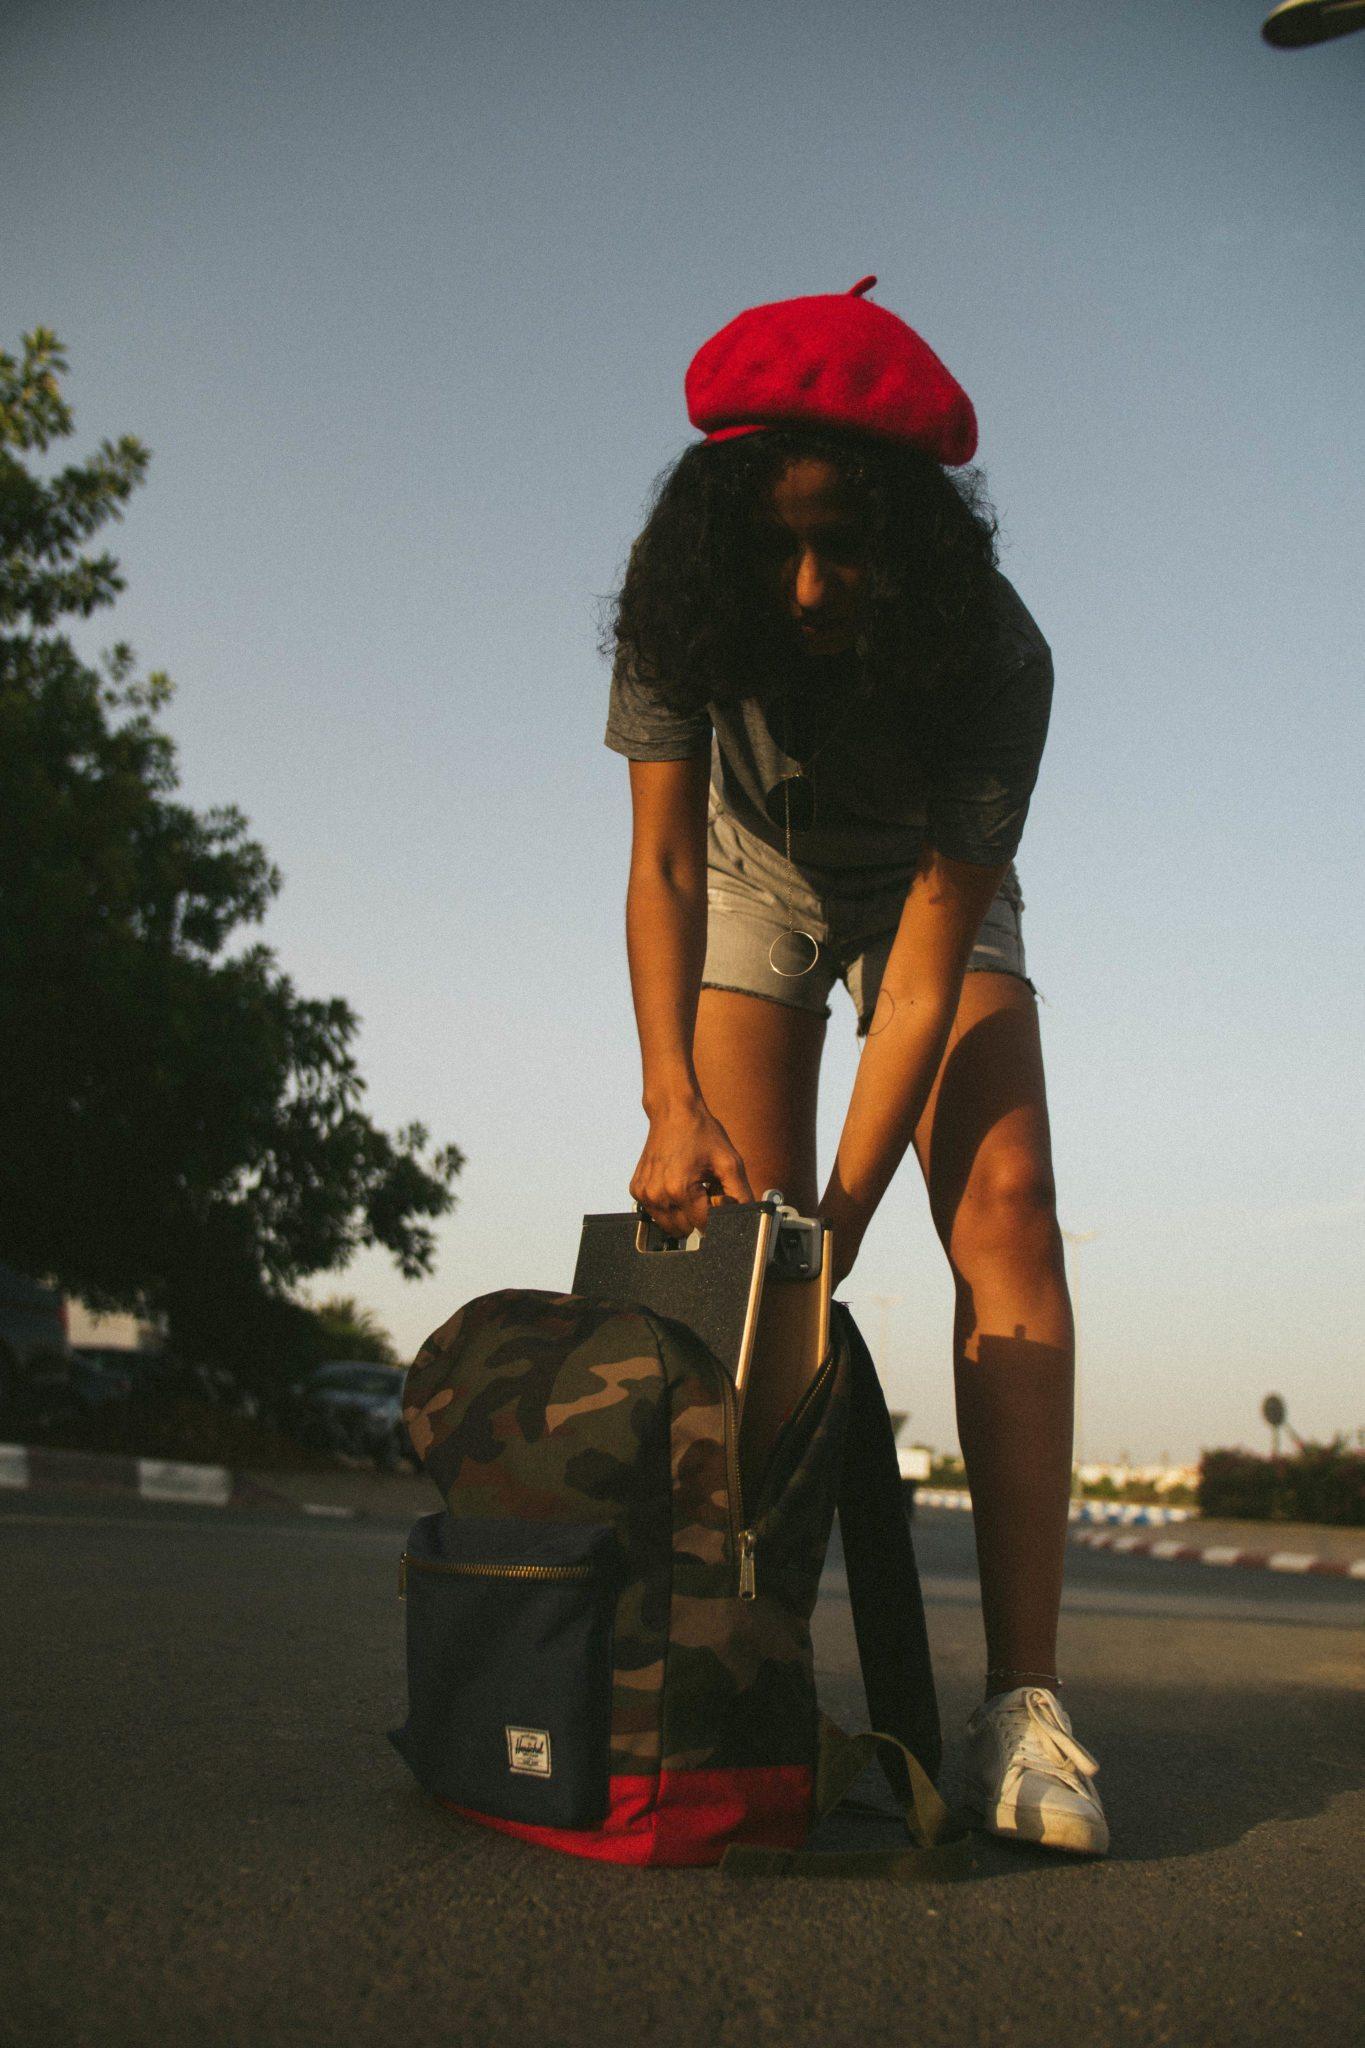 boardup-folding-skate-beach-flare-girl-justdalal-5-9